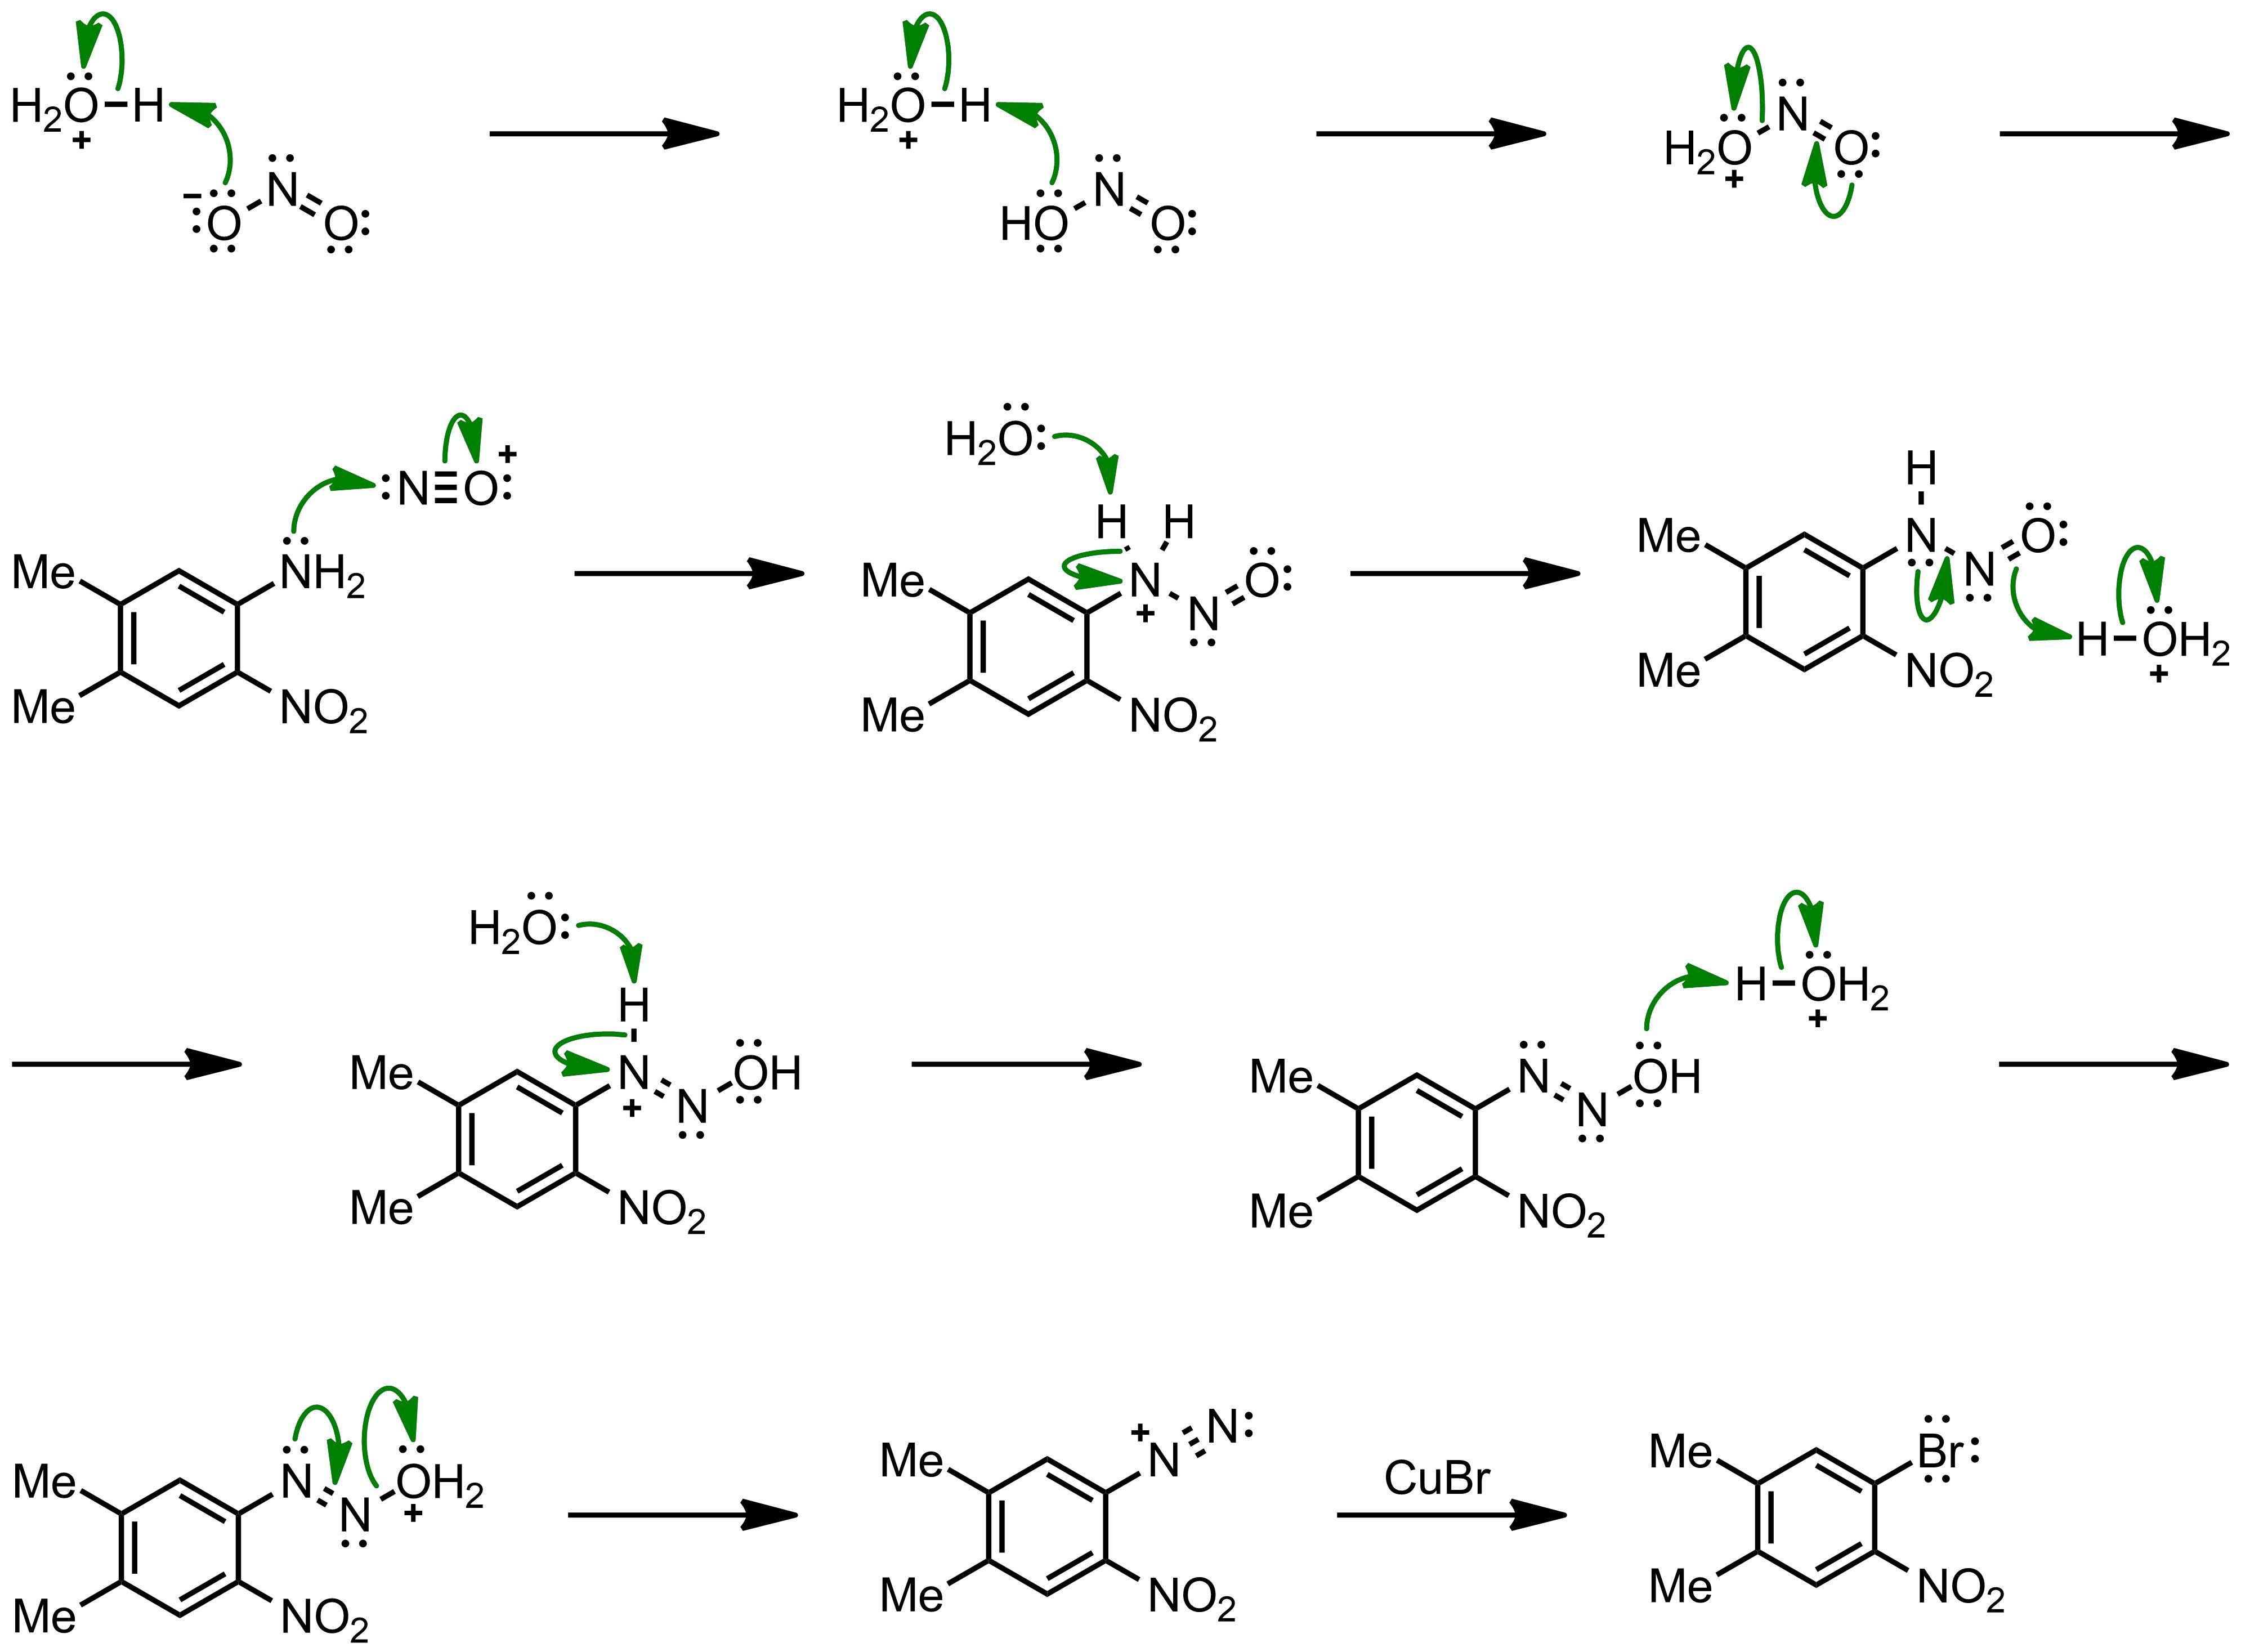 Mechanism of the Sandmeyer Reaction